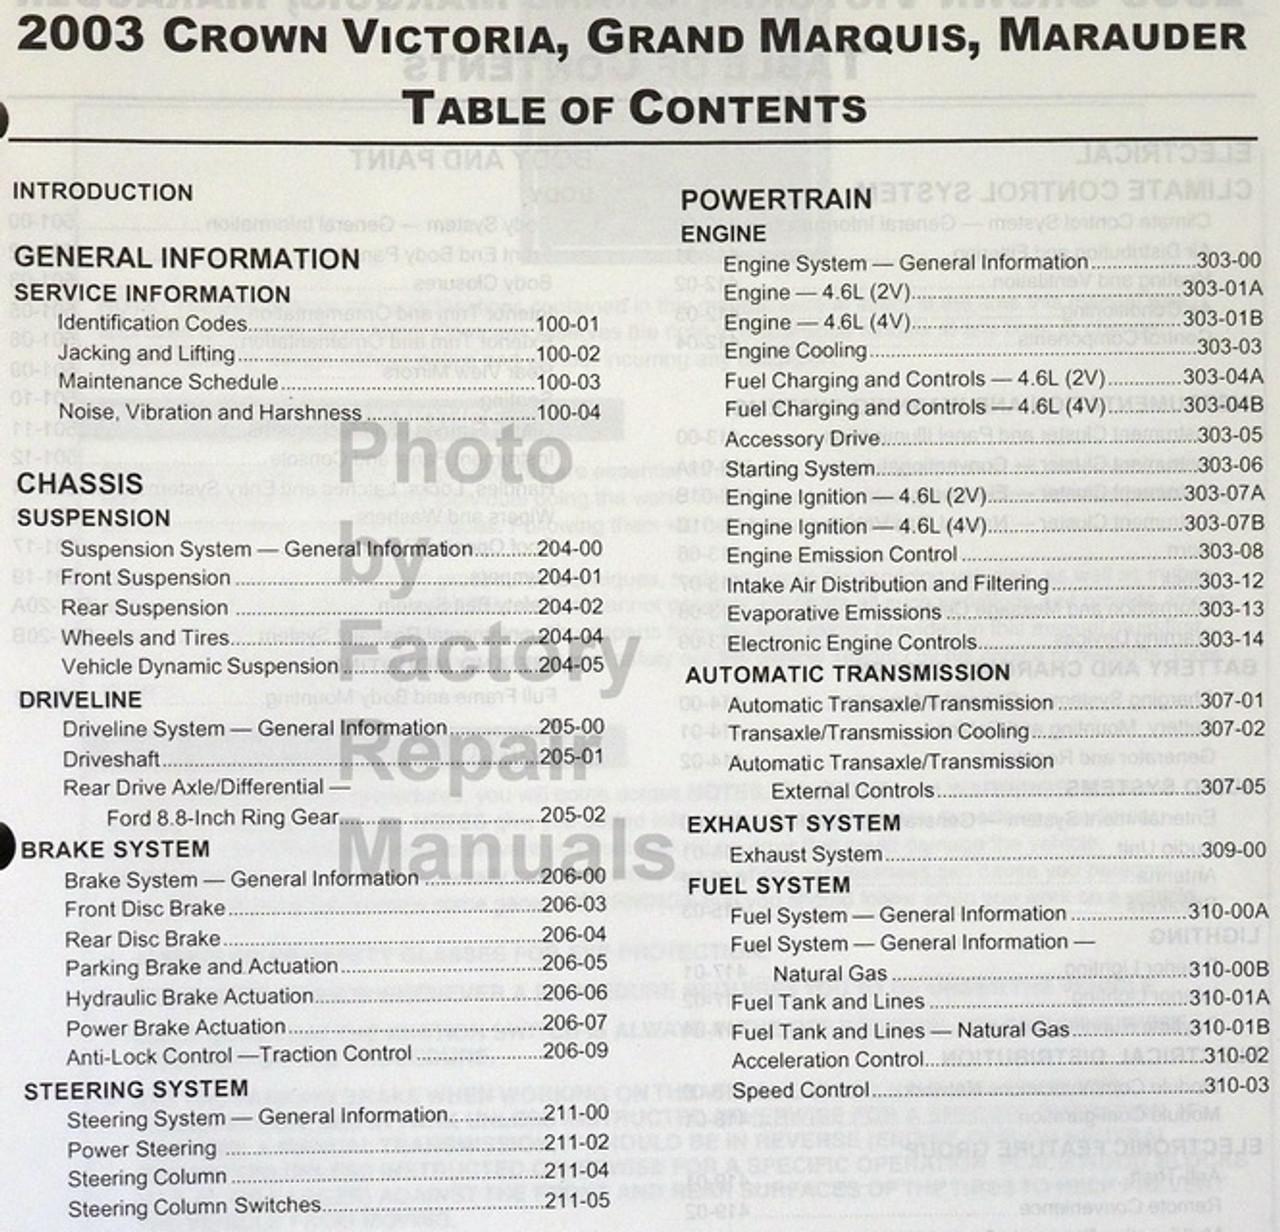 2003 Crown Victoria Grand Marquis Marauder Factory Shop Service Manual Used Factory Repair Manuals